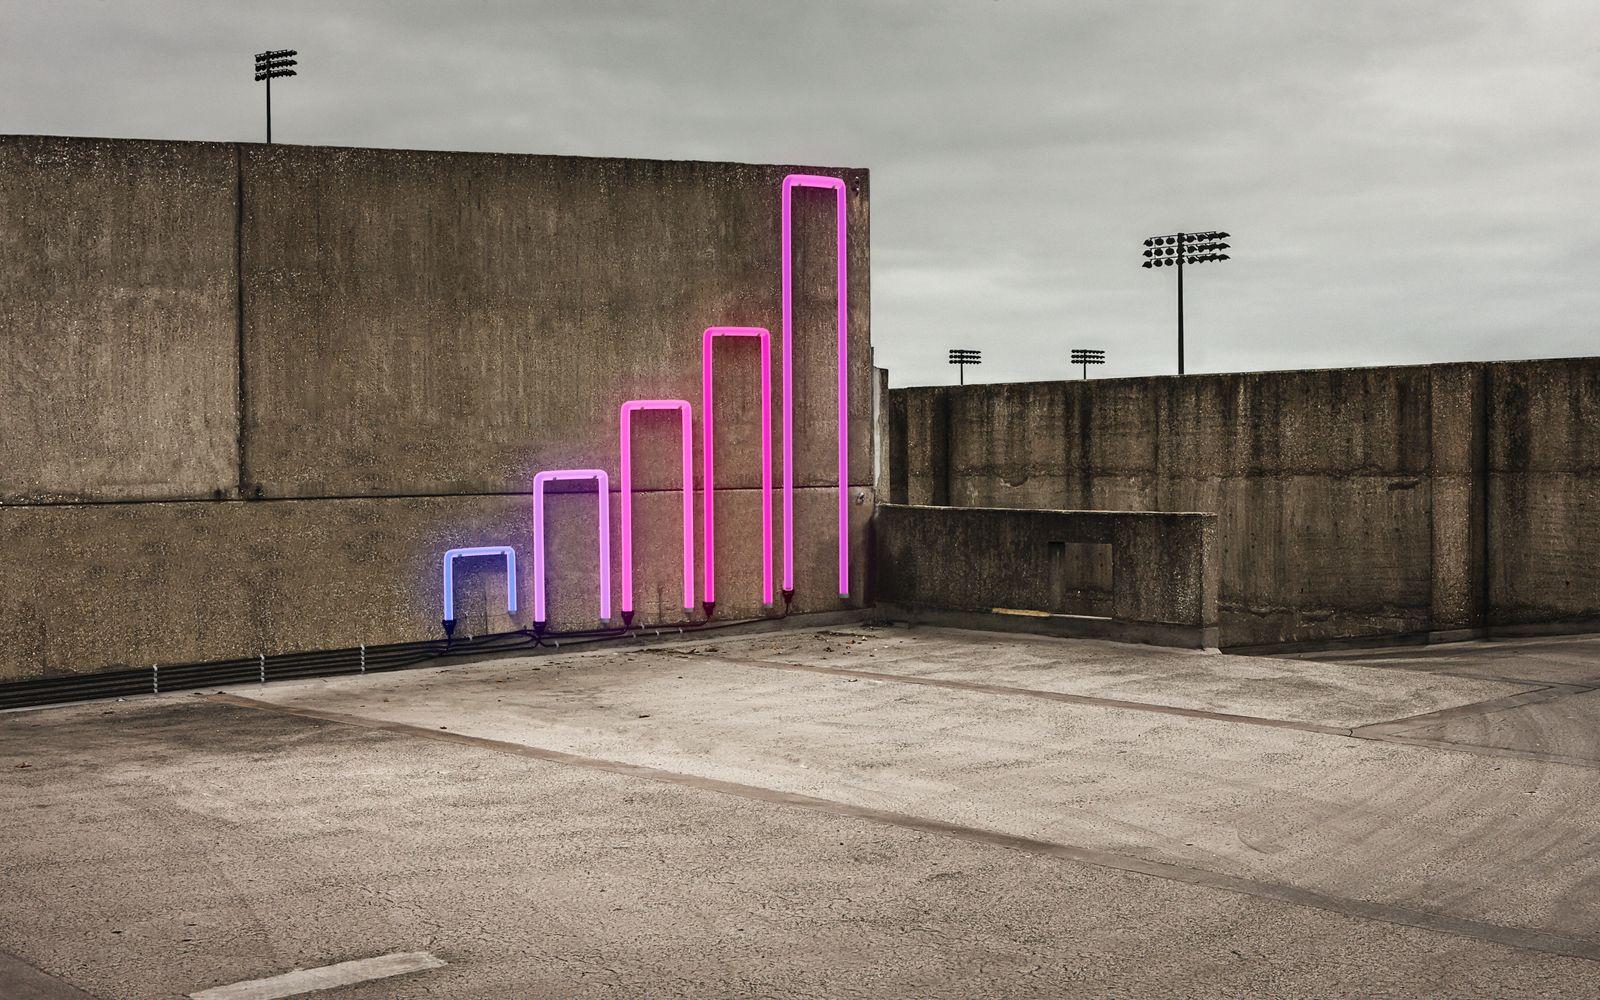 Growth Neons